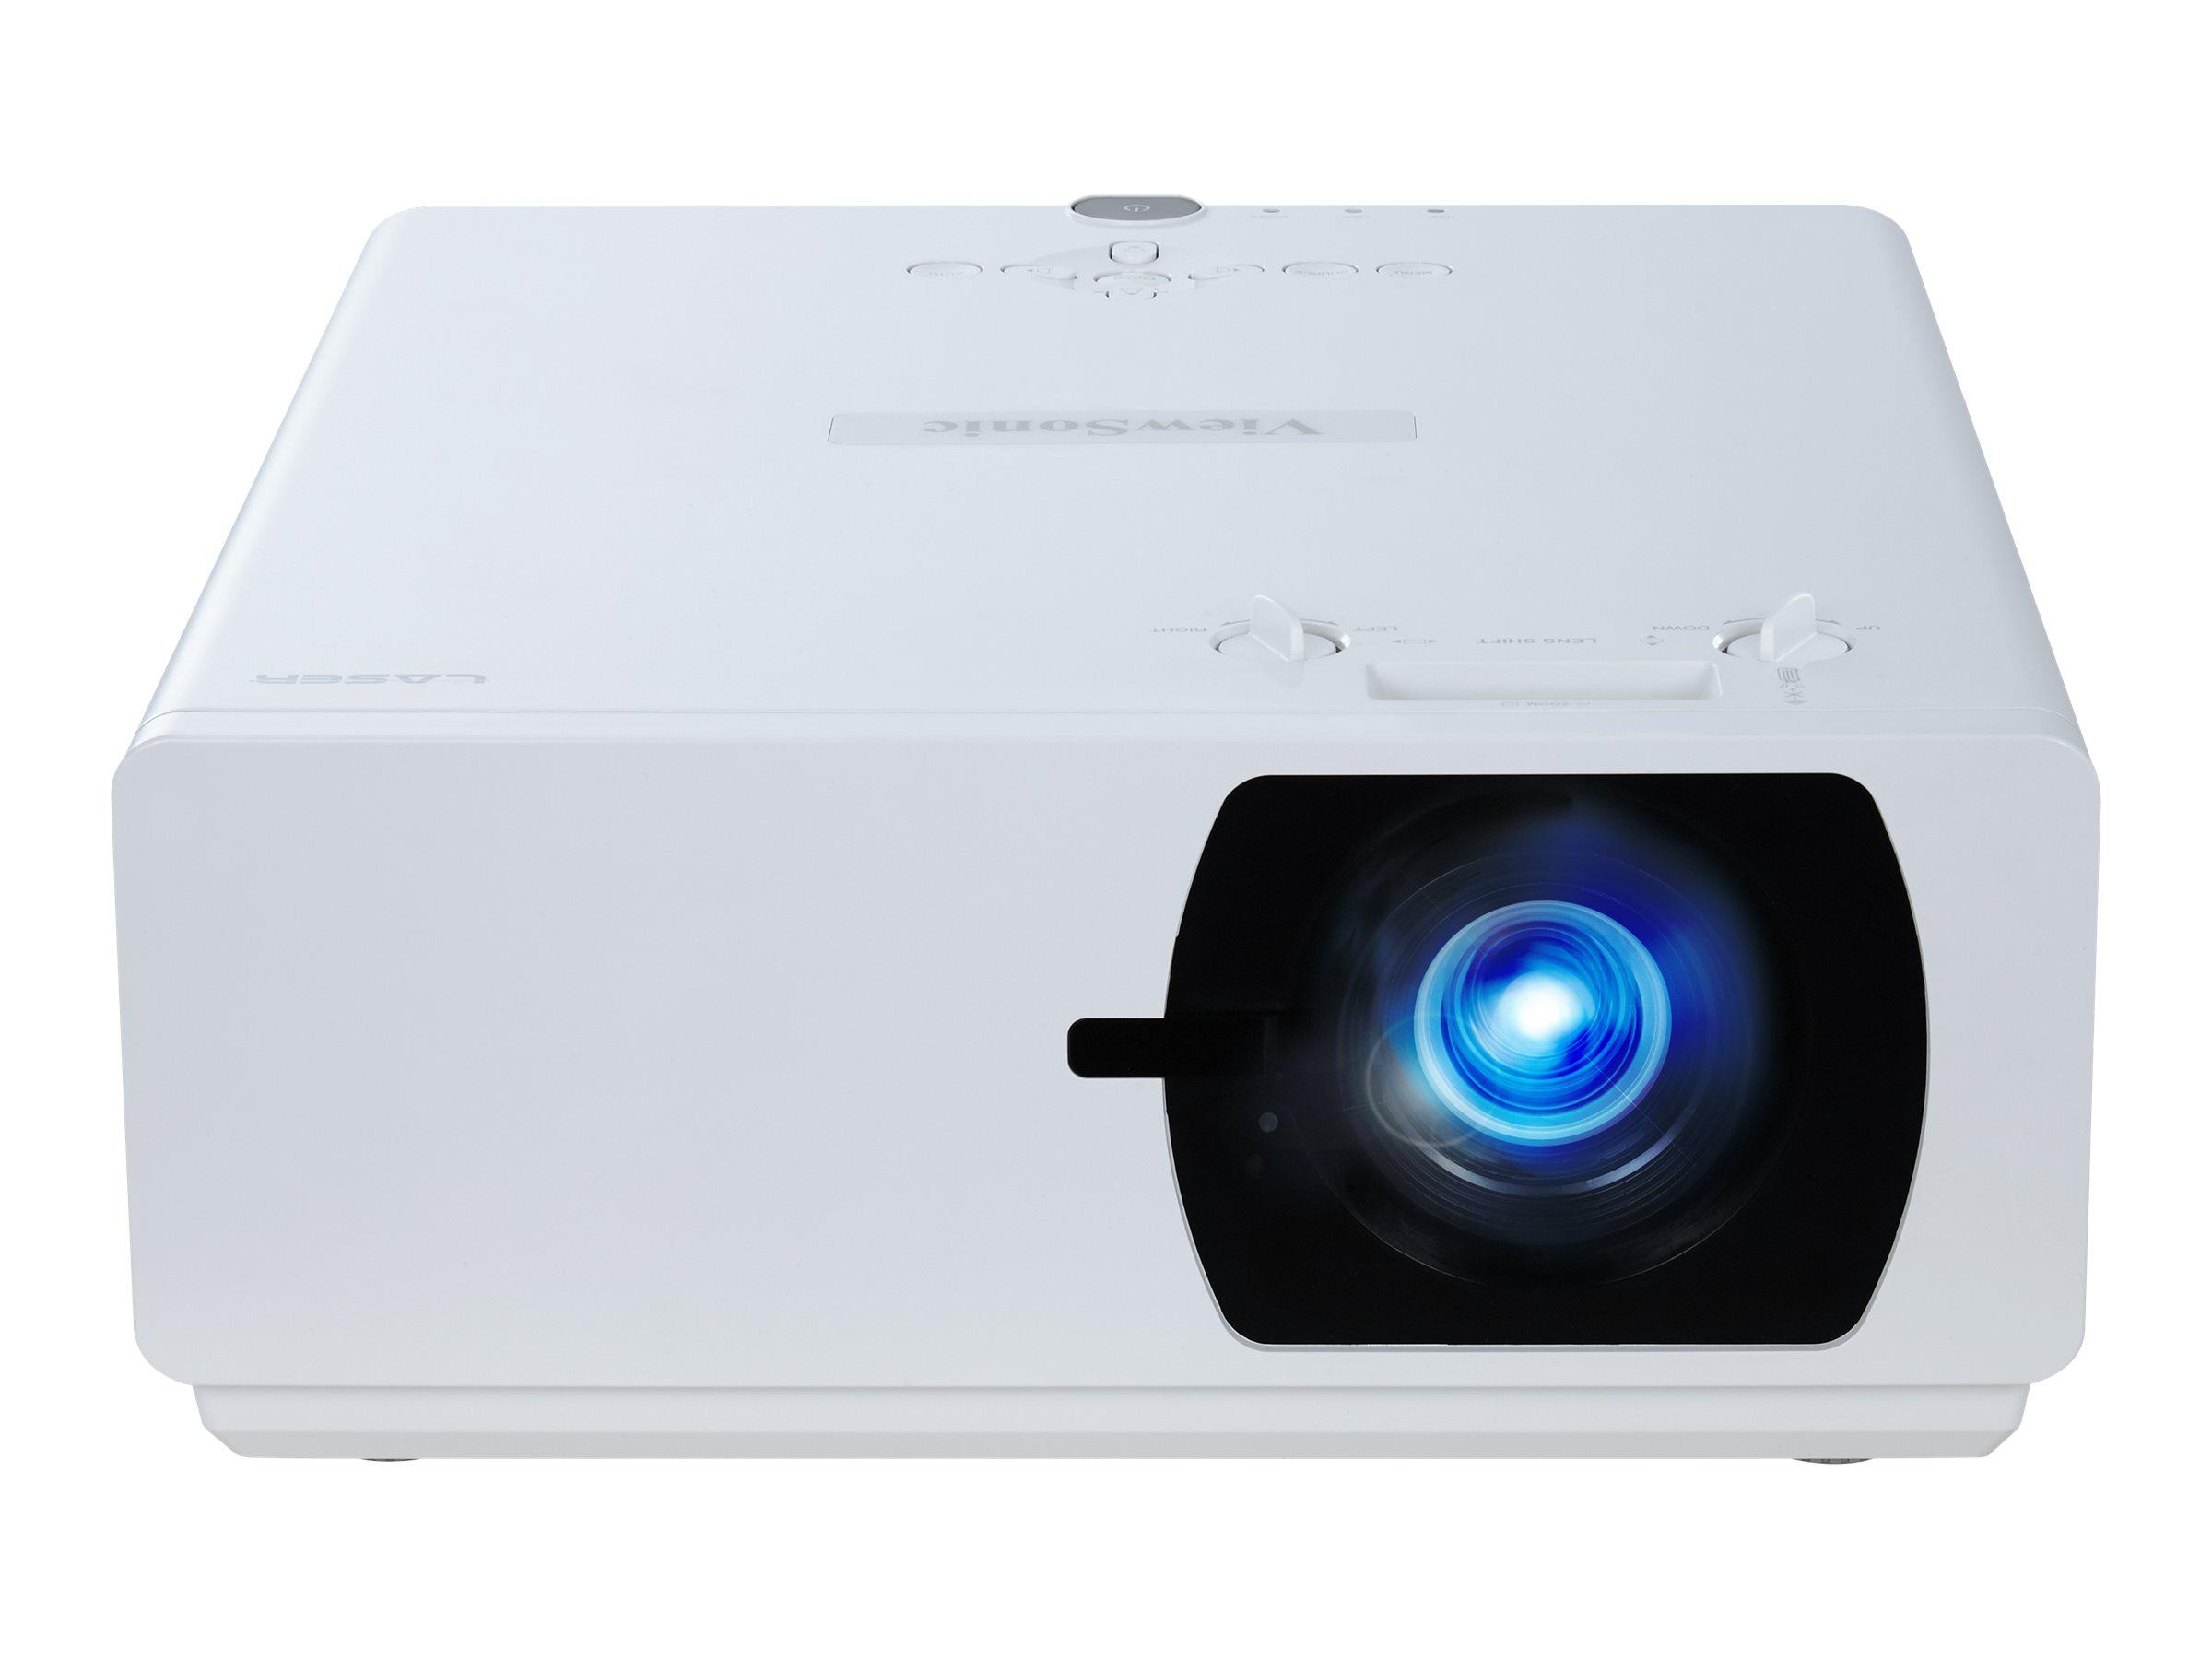 ViewSonic LS900WU - DLP-Projektor - Laser/Phosphor - 6000 ANSI-Lumen - WUXGA (1920 x 1200) - 16:10